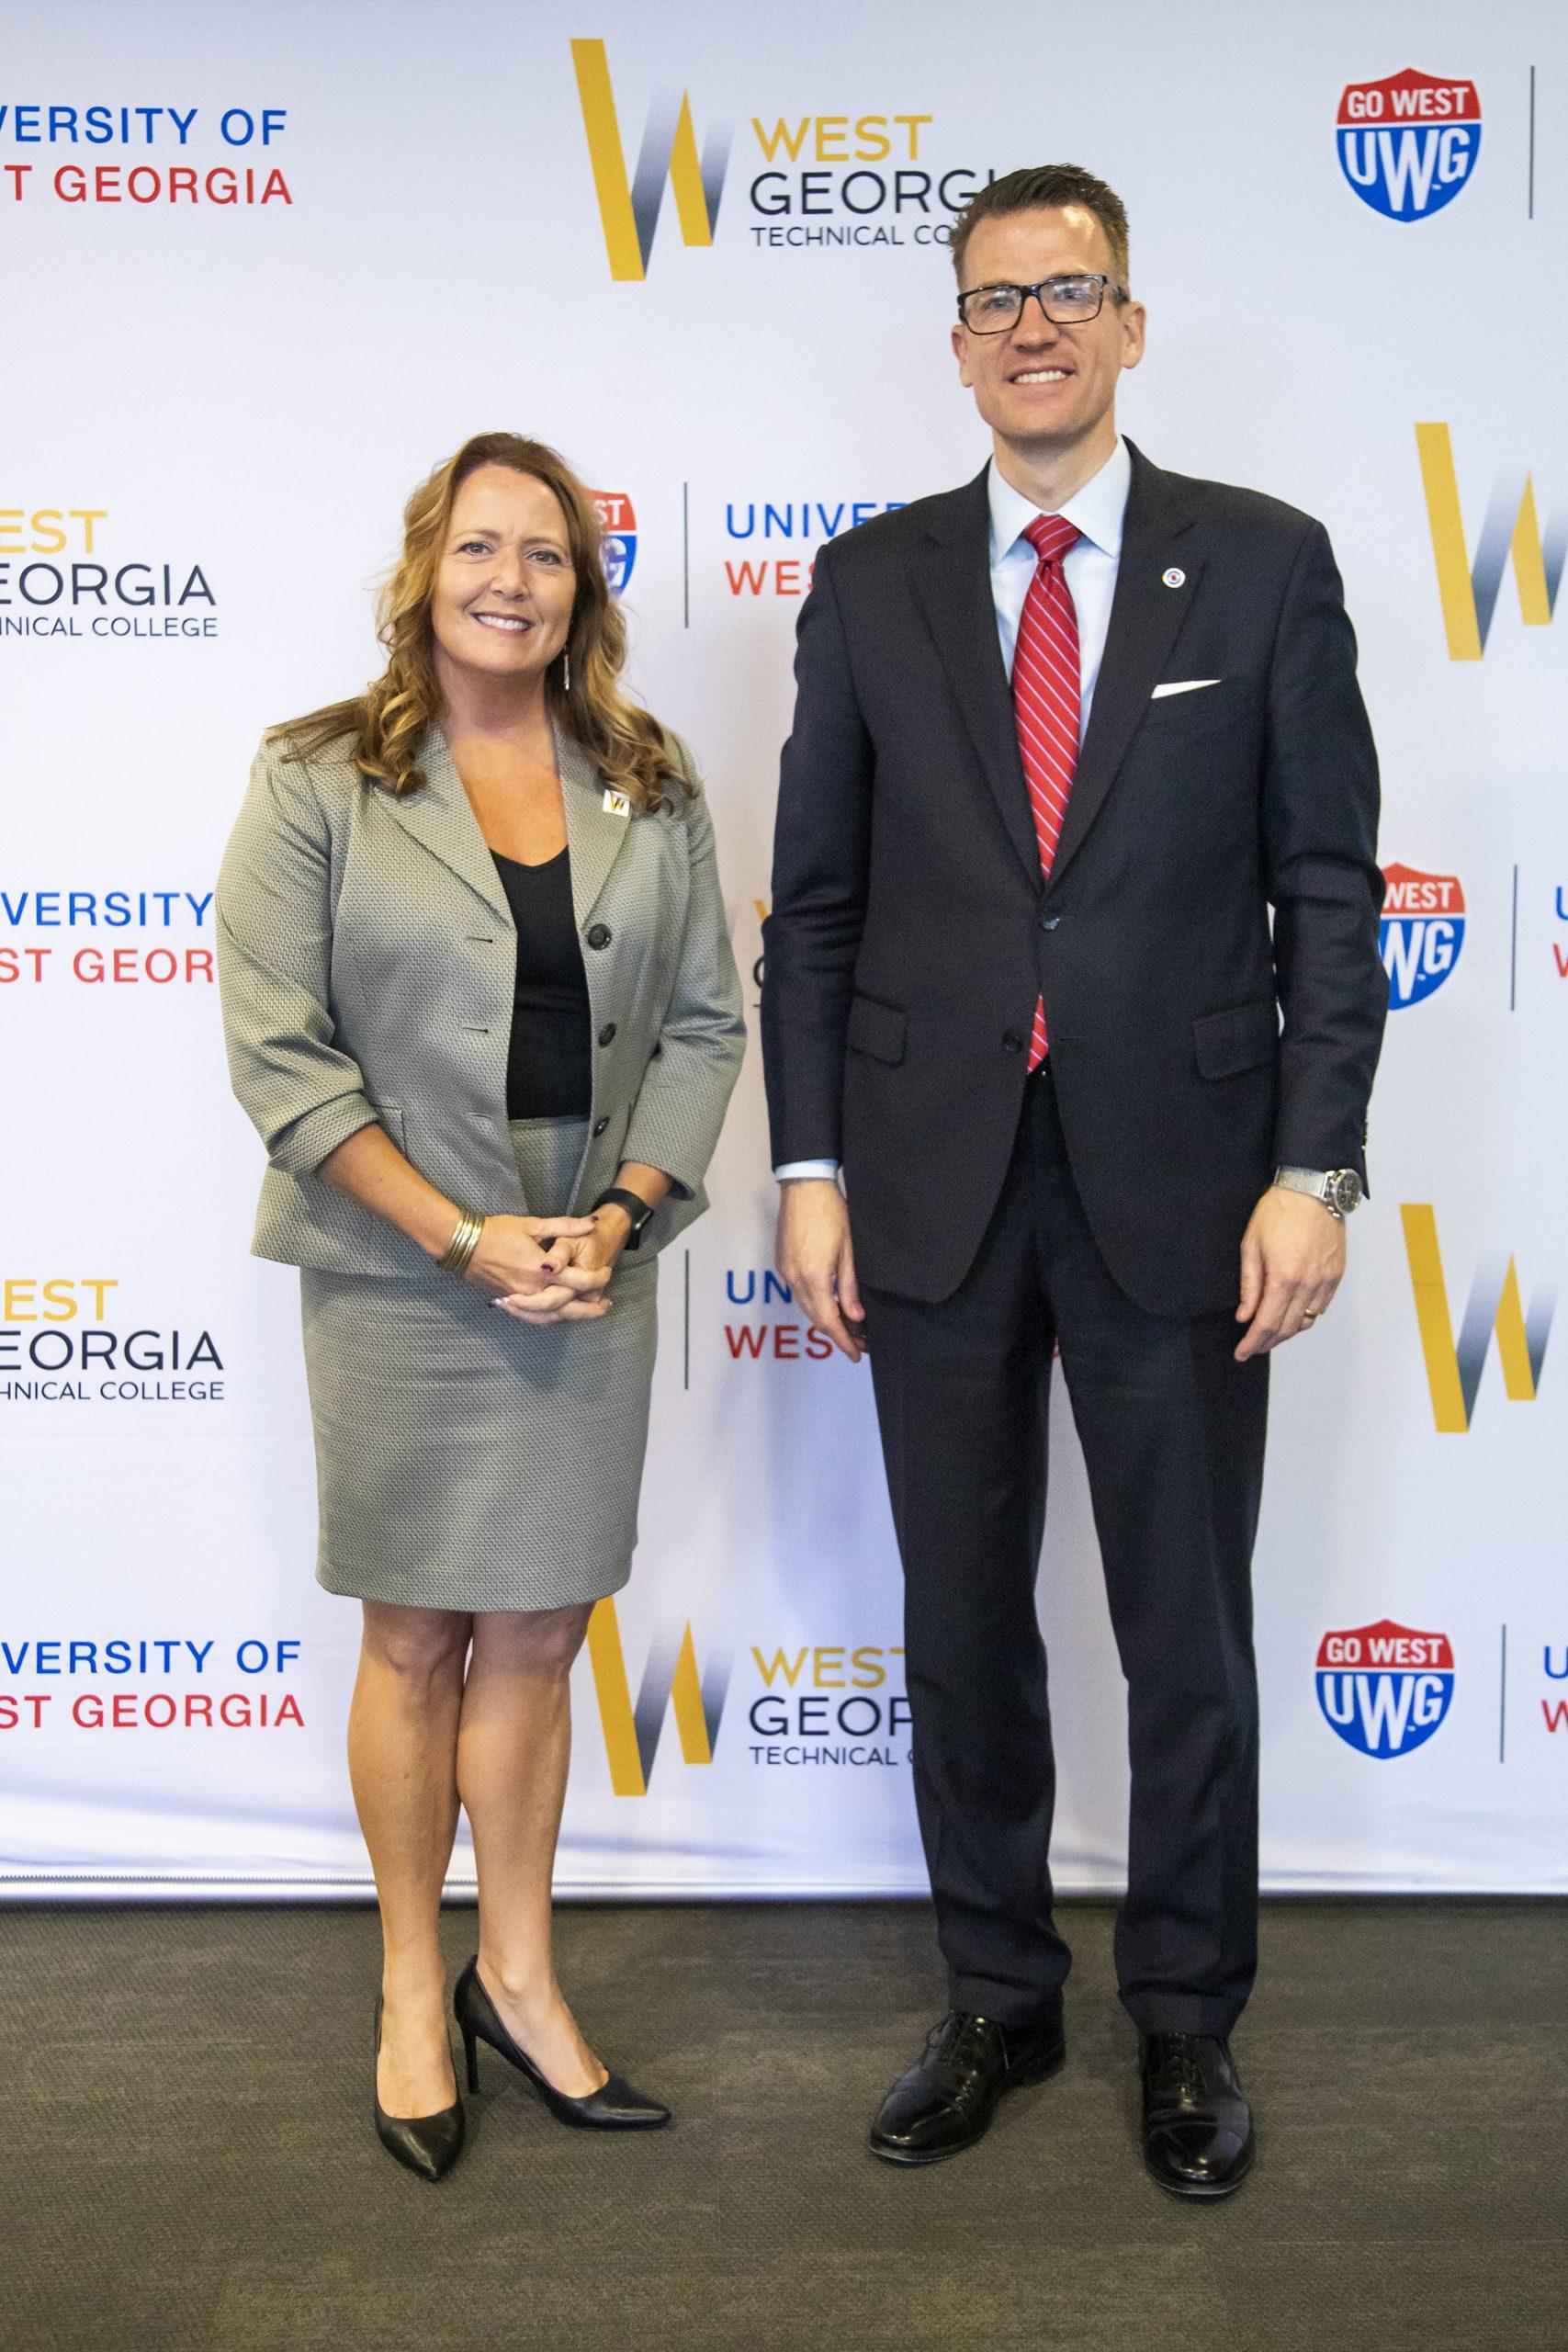 WGTC President Dr. Julie Post and UWG President Dr. Brendan Kelly